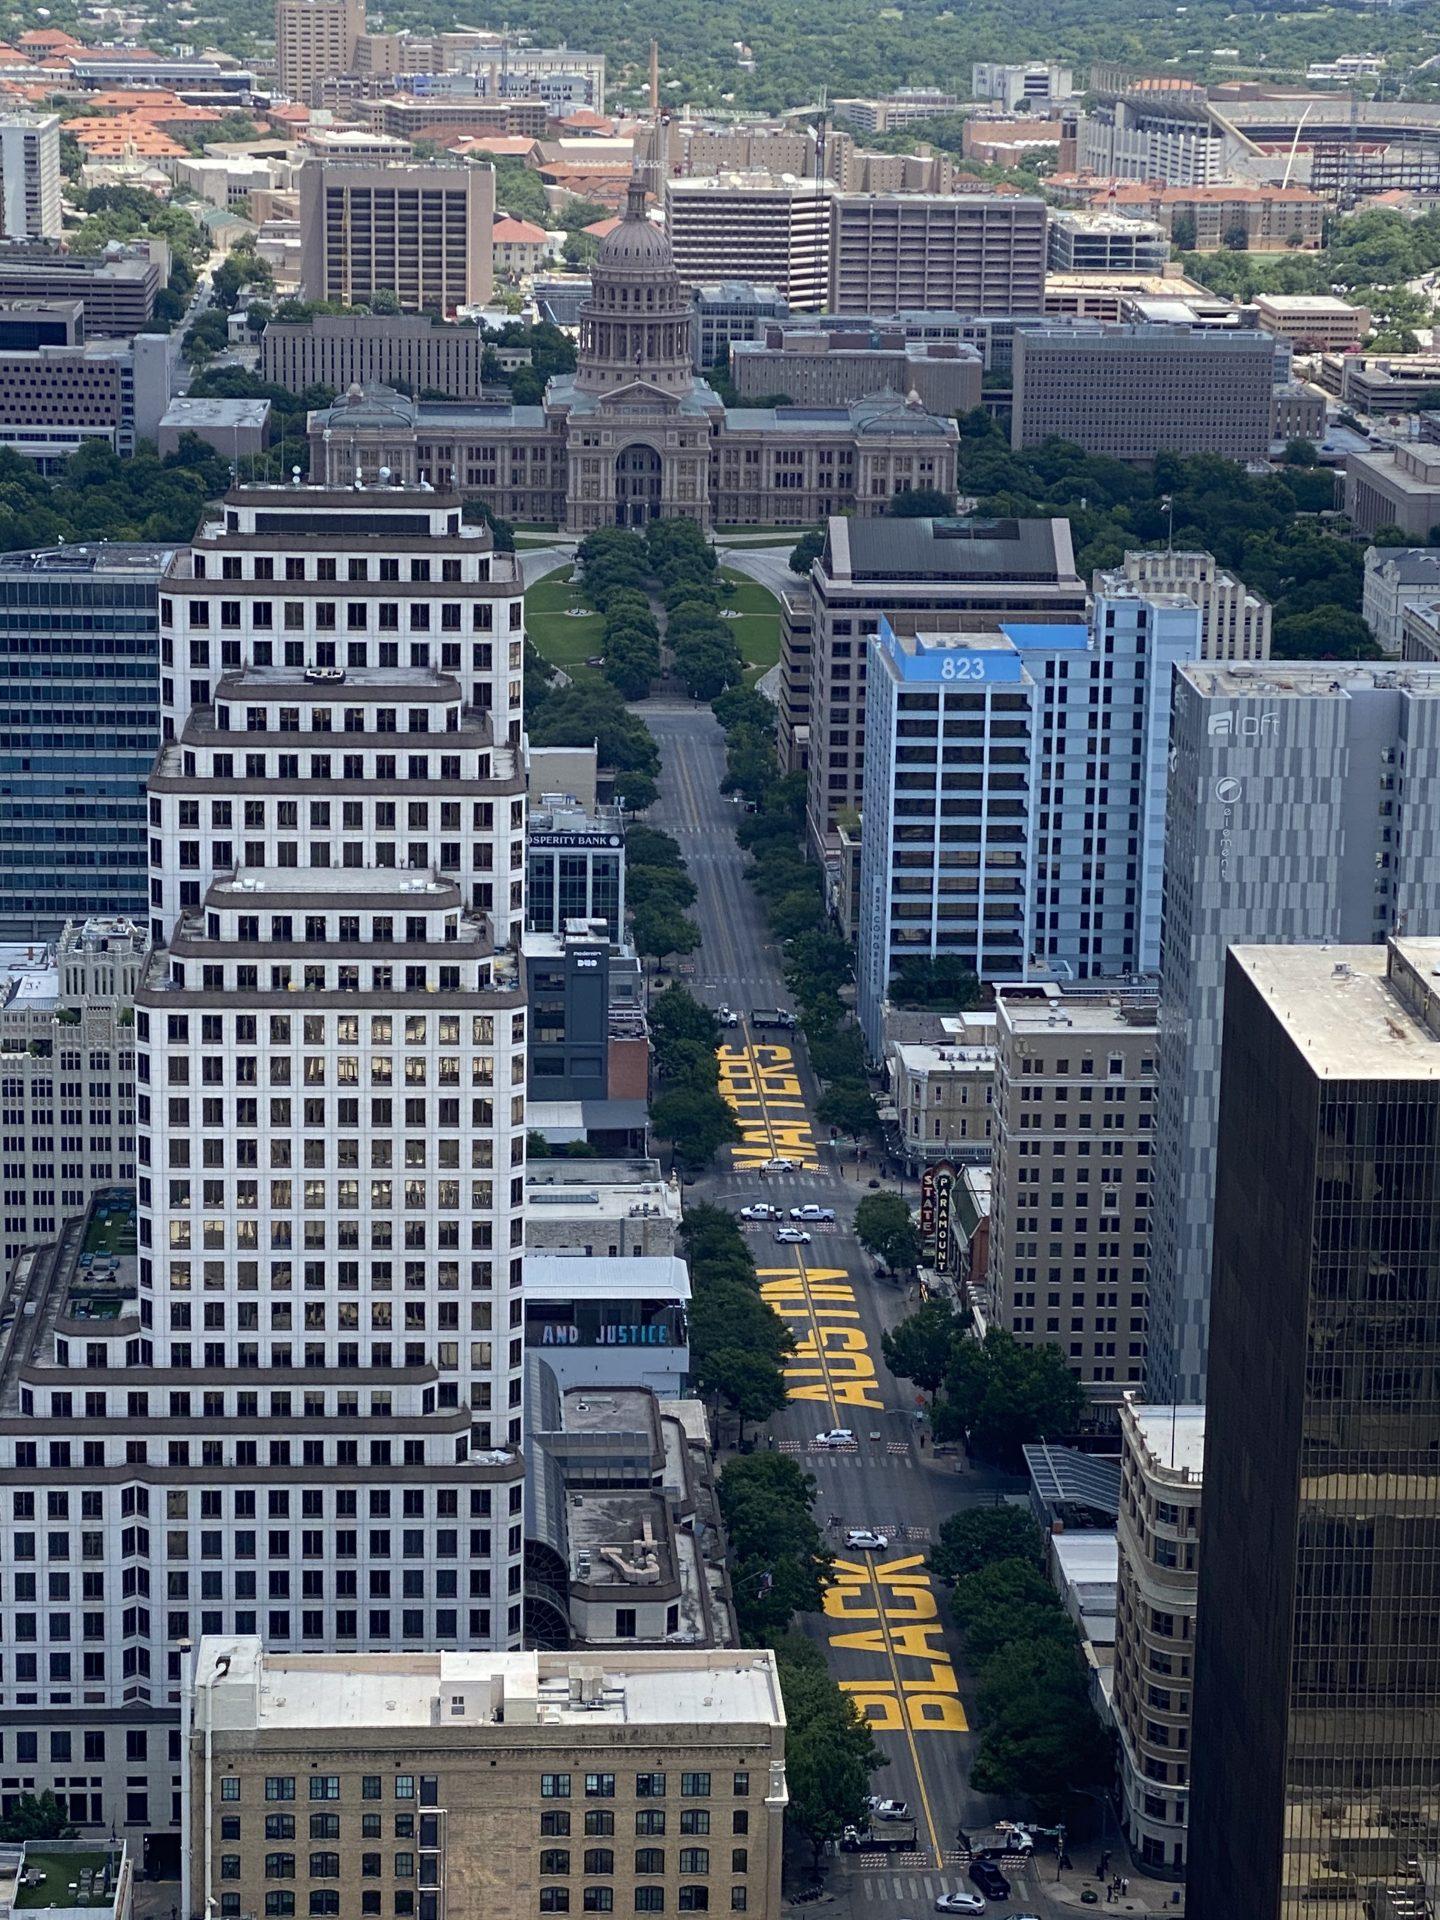 Texas Capitol Black Austin Matters